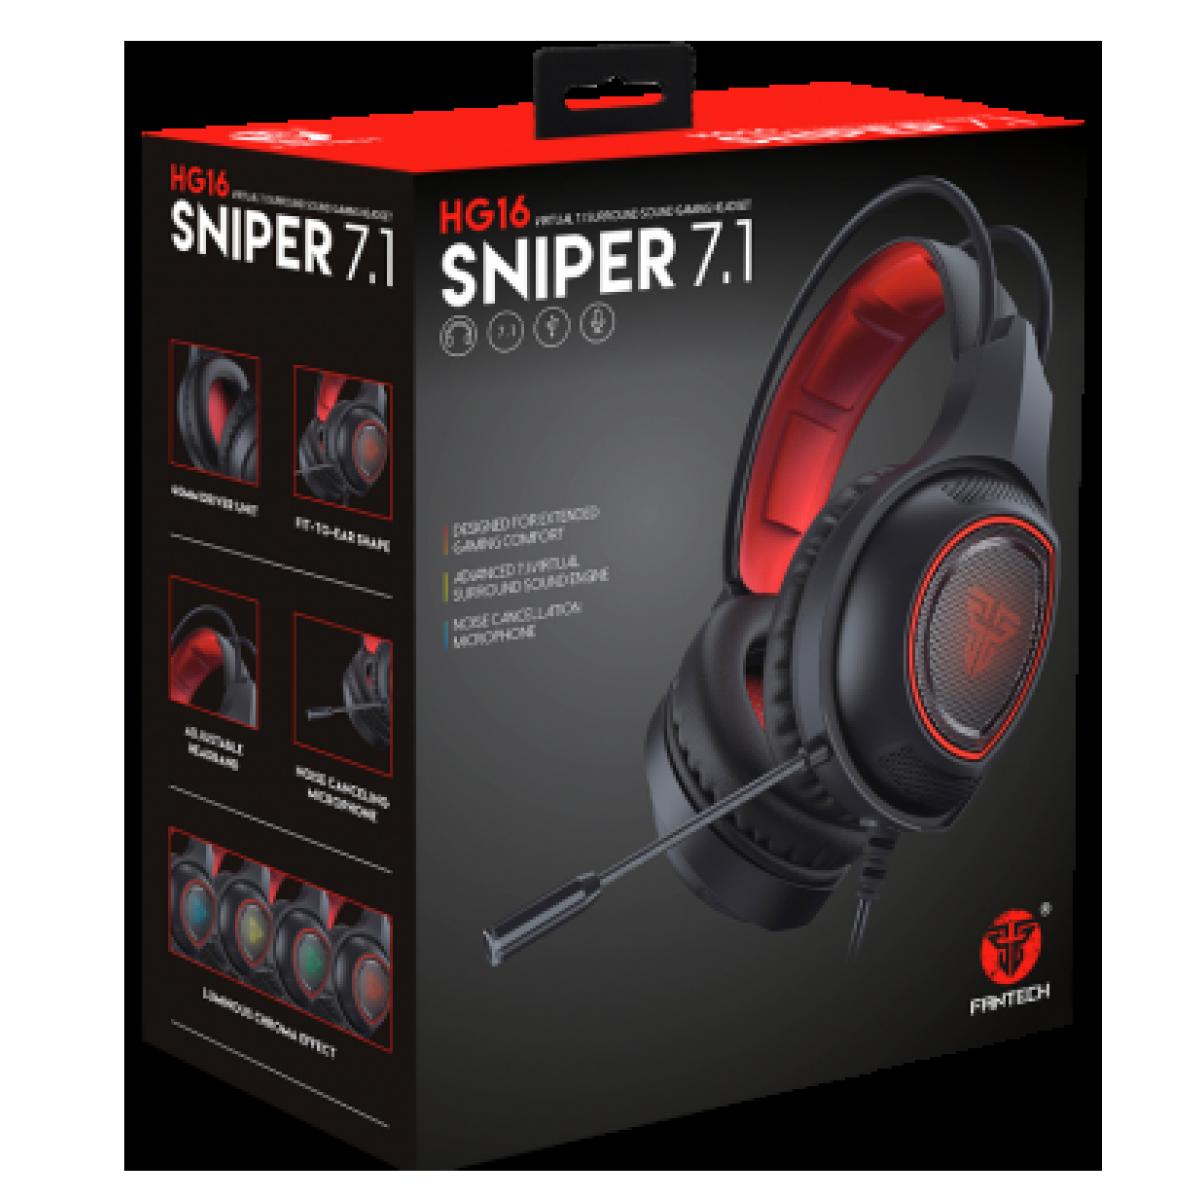 Headset Gamer Fantech Sniper, USB, RGB, Black/RED, HG16